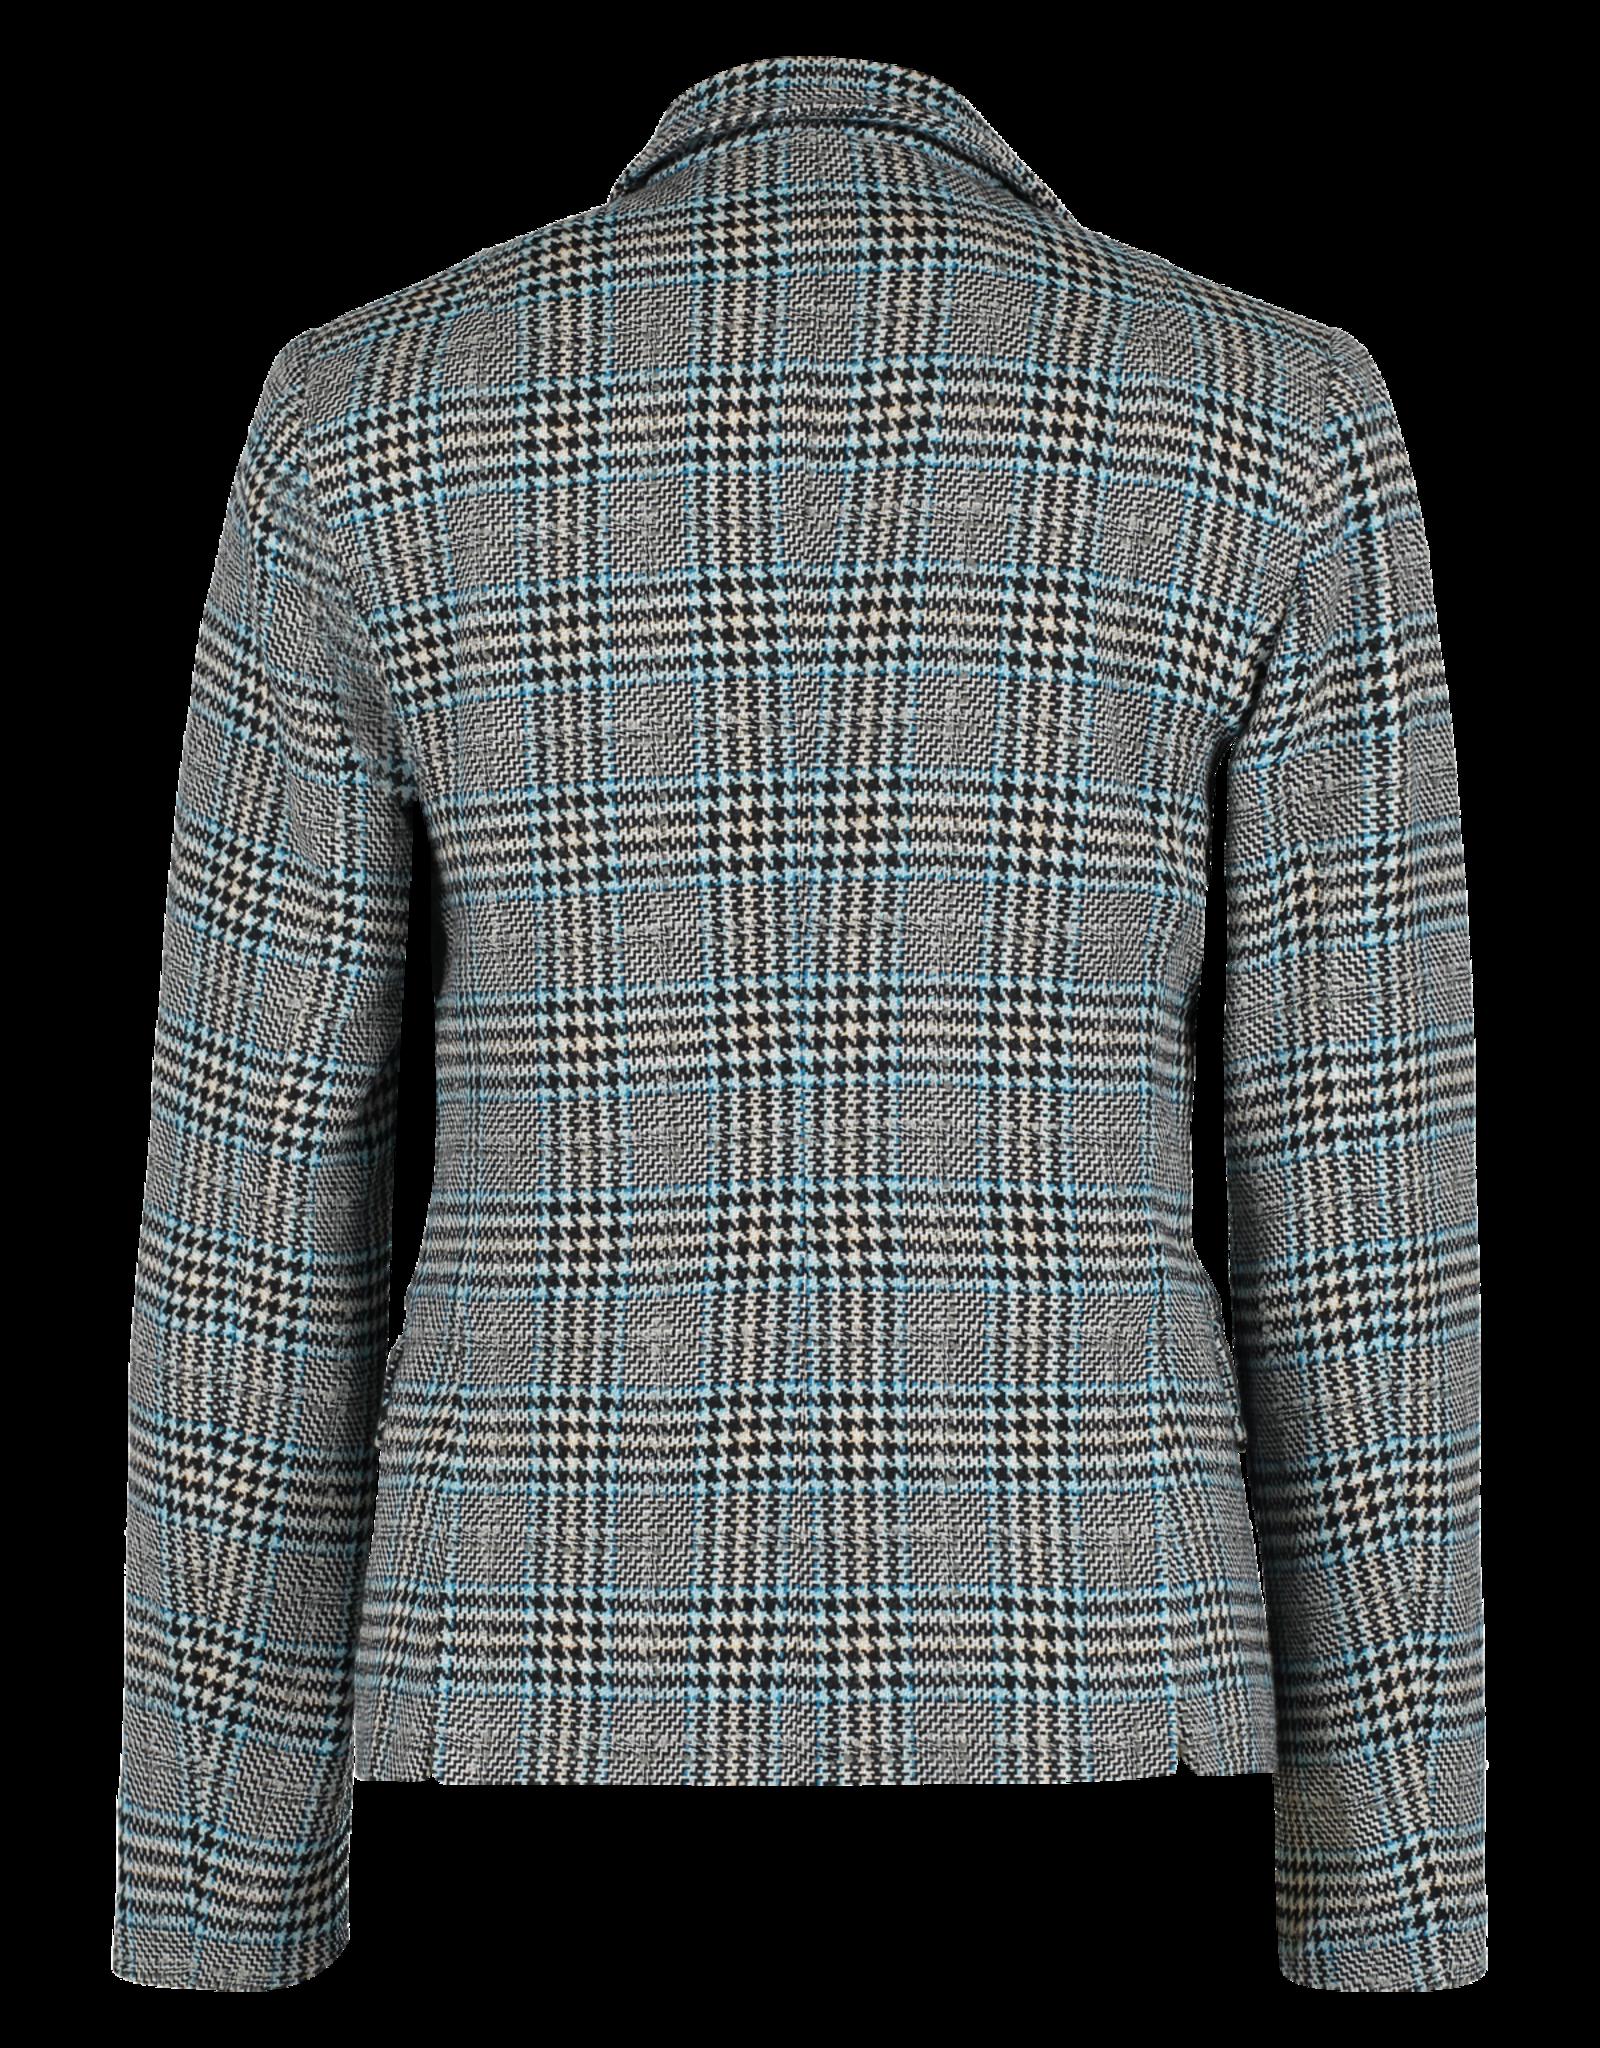 AW1920 400-J Little Jacket